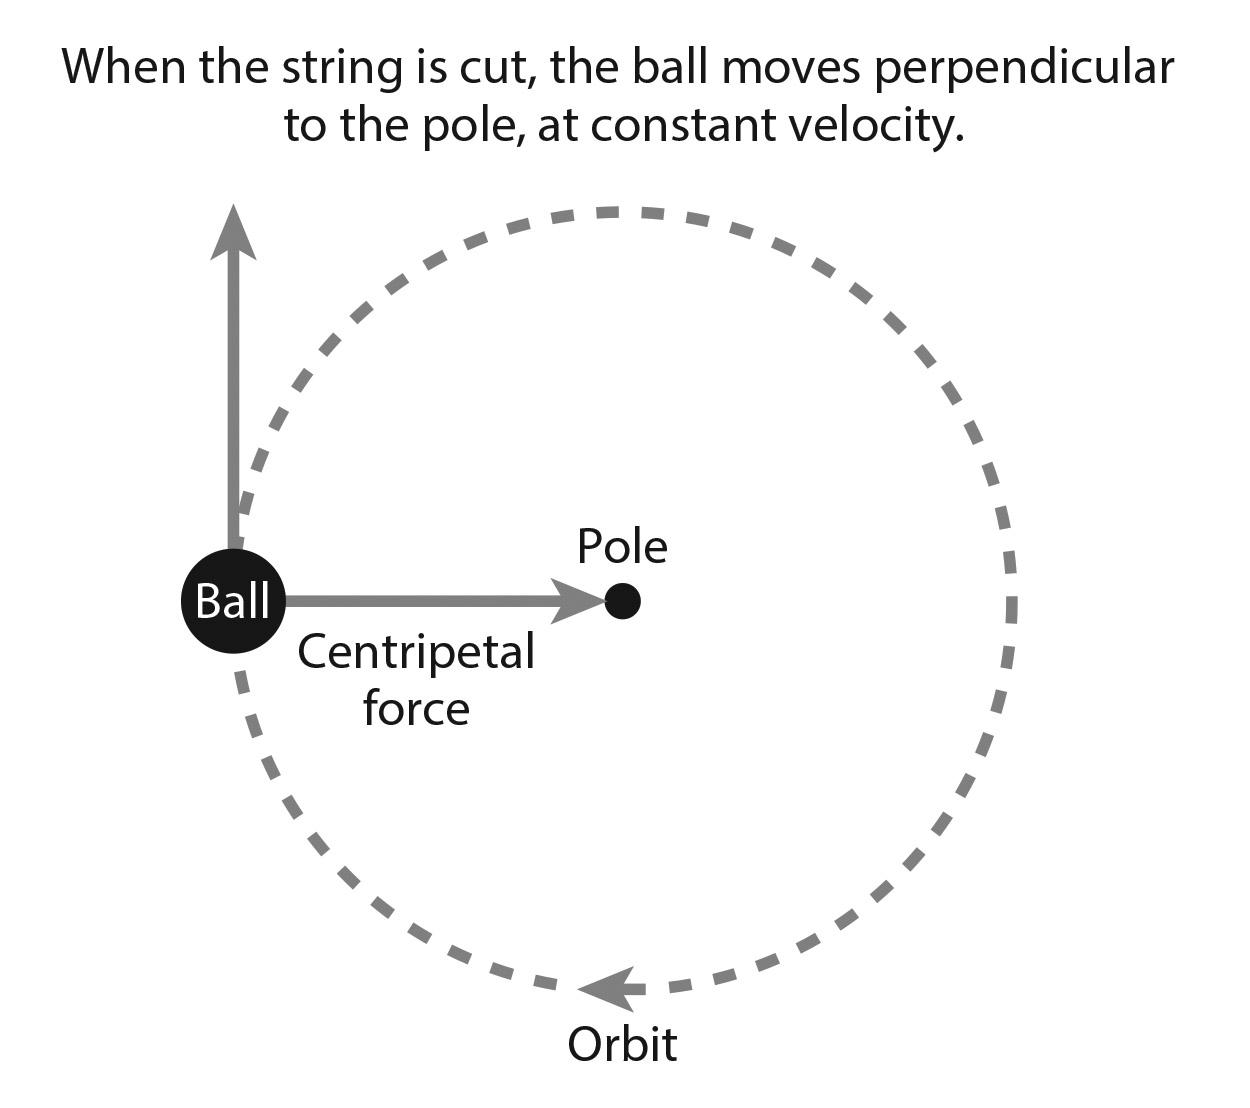 Weekly Science Quiz: Centrifugal vs. Centripetal